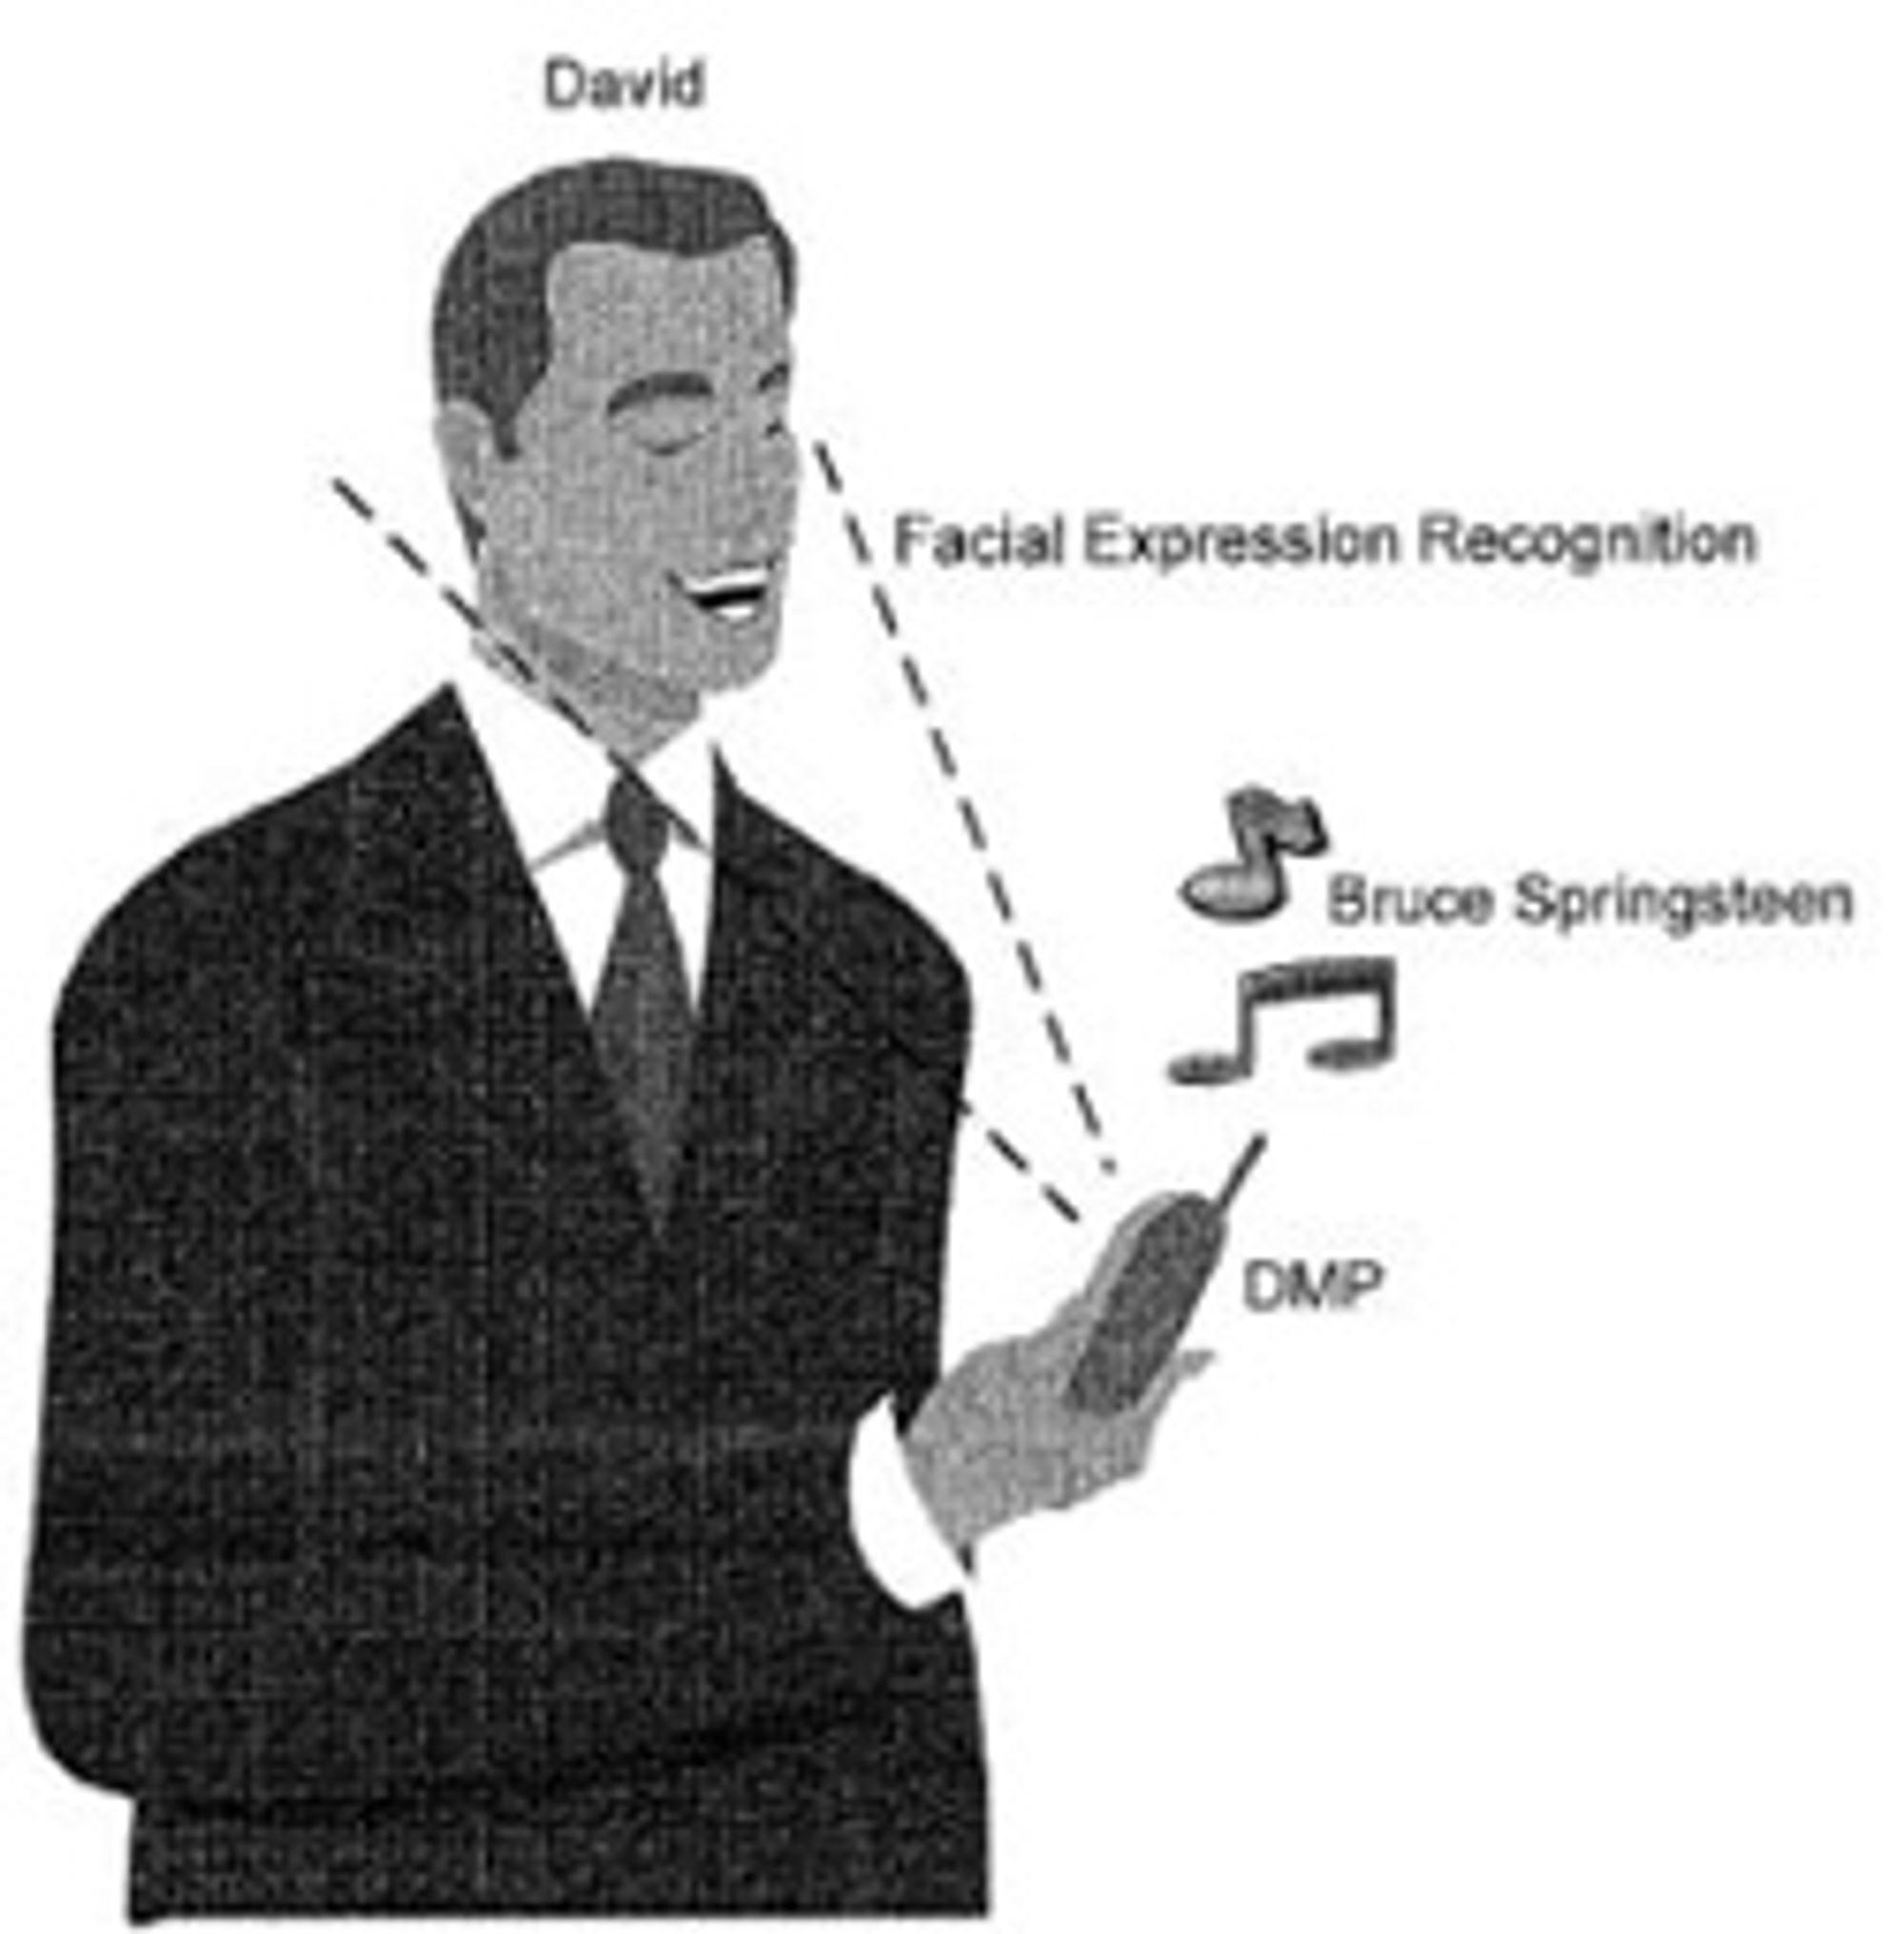 Patenttegning fra Sony Ericsson. (Bilde: Sony Ericsson)